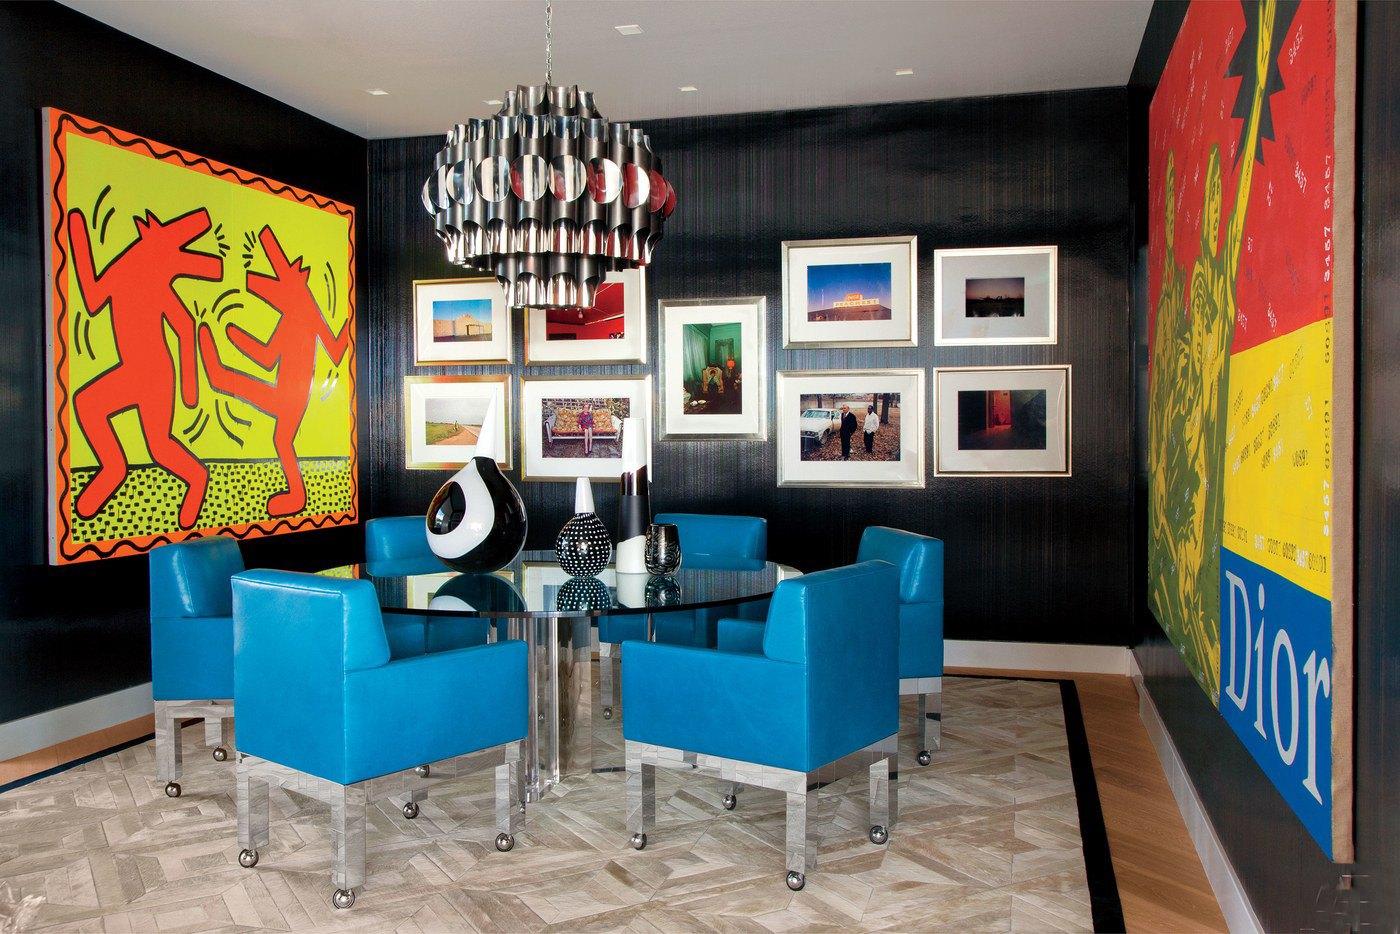 celebrity dining room 10 Celebrity Dining Rooms That You Will Love elton john